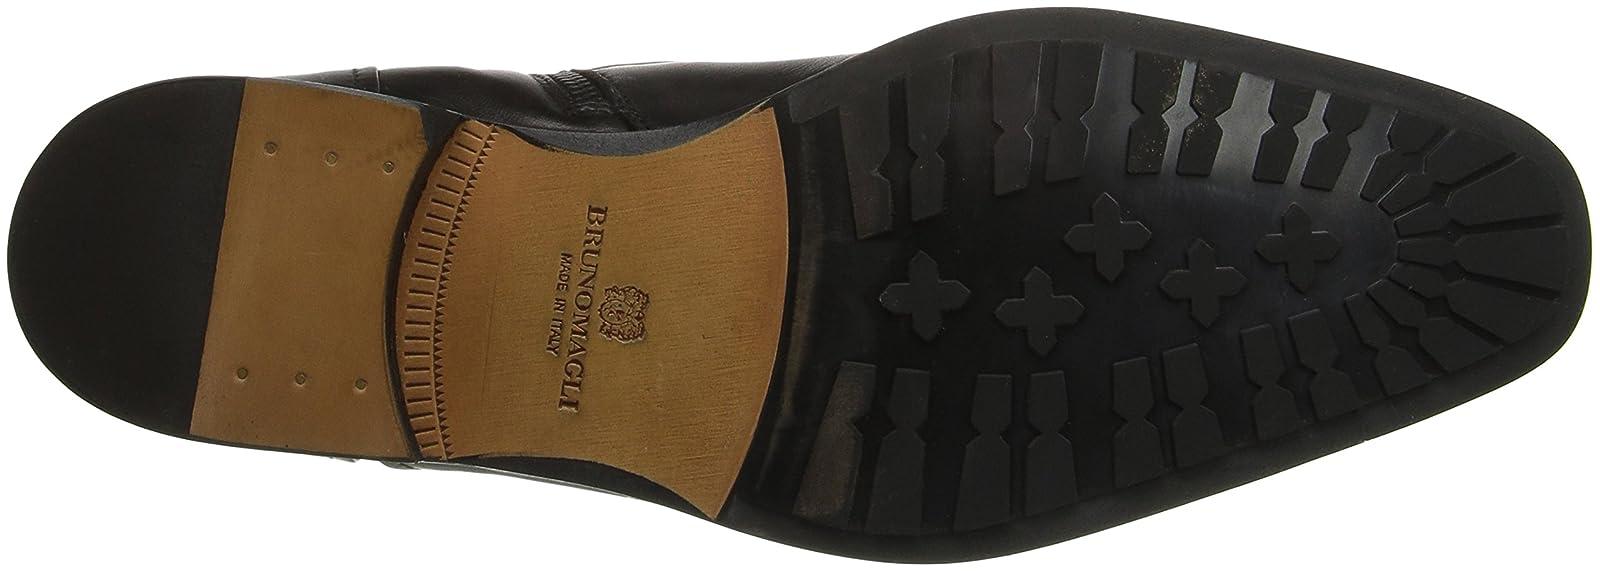 Bruno Magli Men's Arcadia Boot 11.5 M US - 3